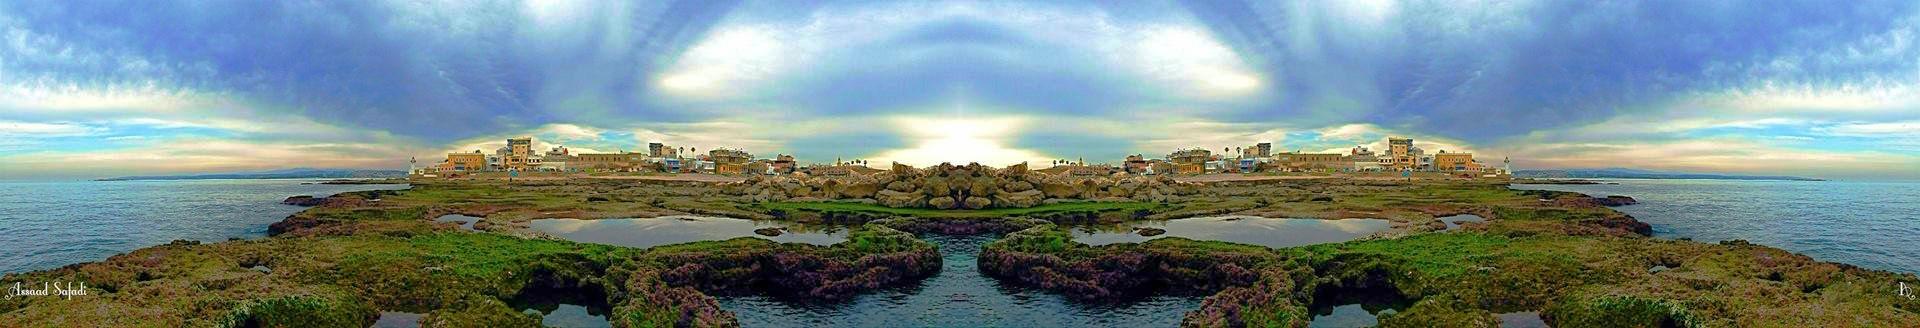 Tyre city . by Assaad M Safadi